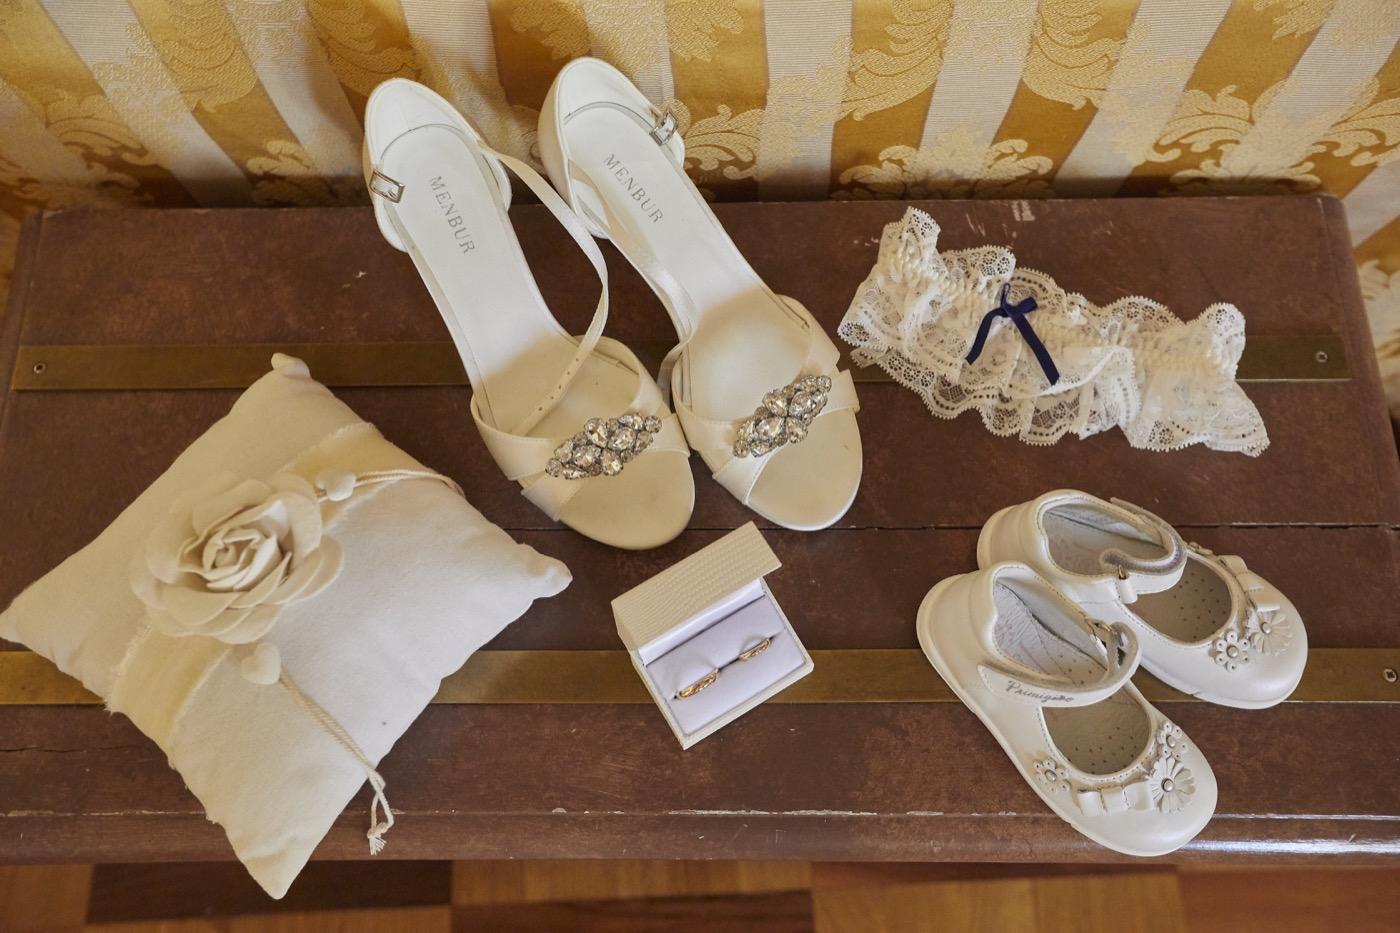 Claudio-Coppola-wedding-photographer-la-scuderia-eventi-preparativi-la-rosetta-perugia-16